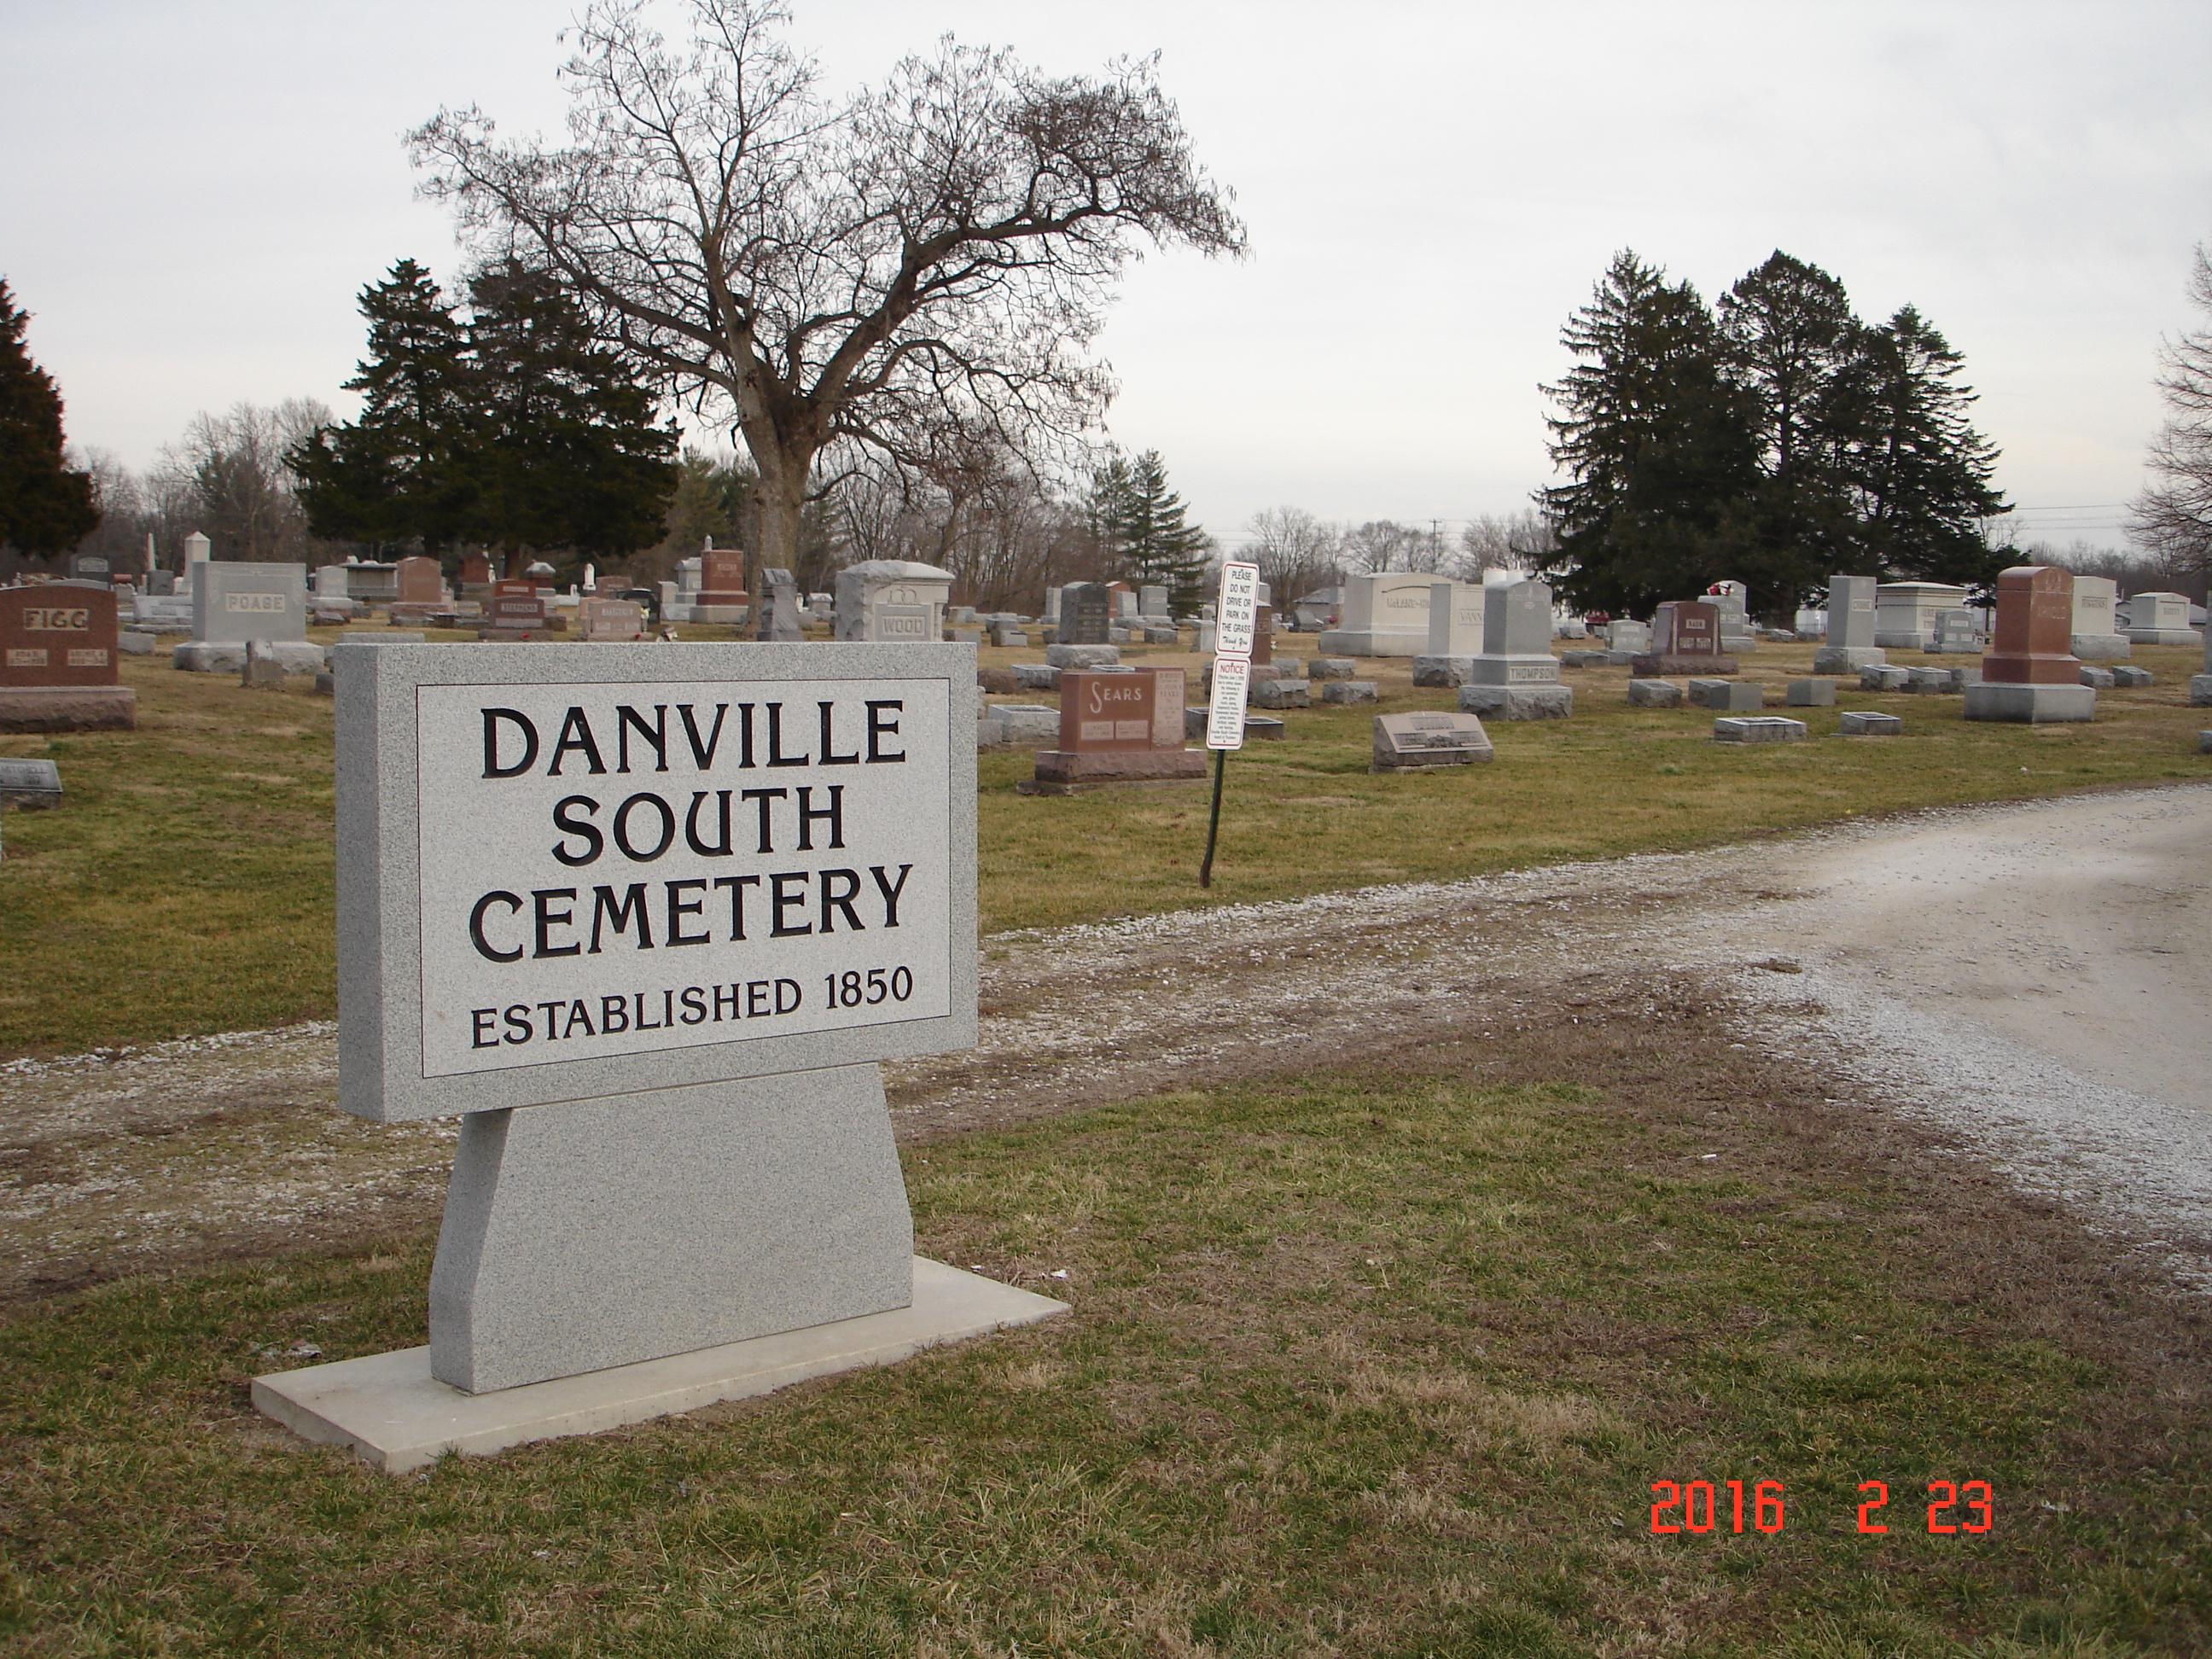 Danville South Cemetery